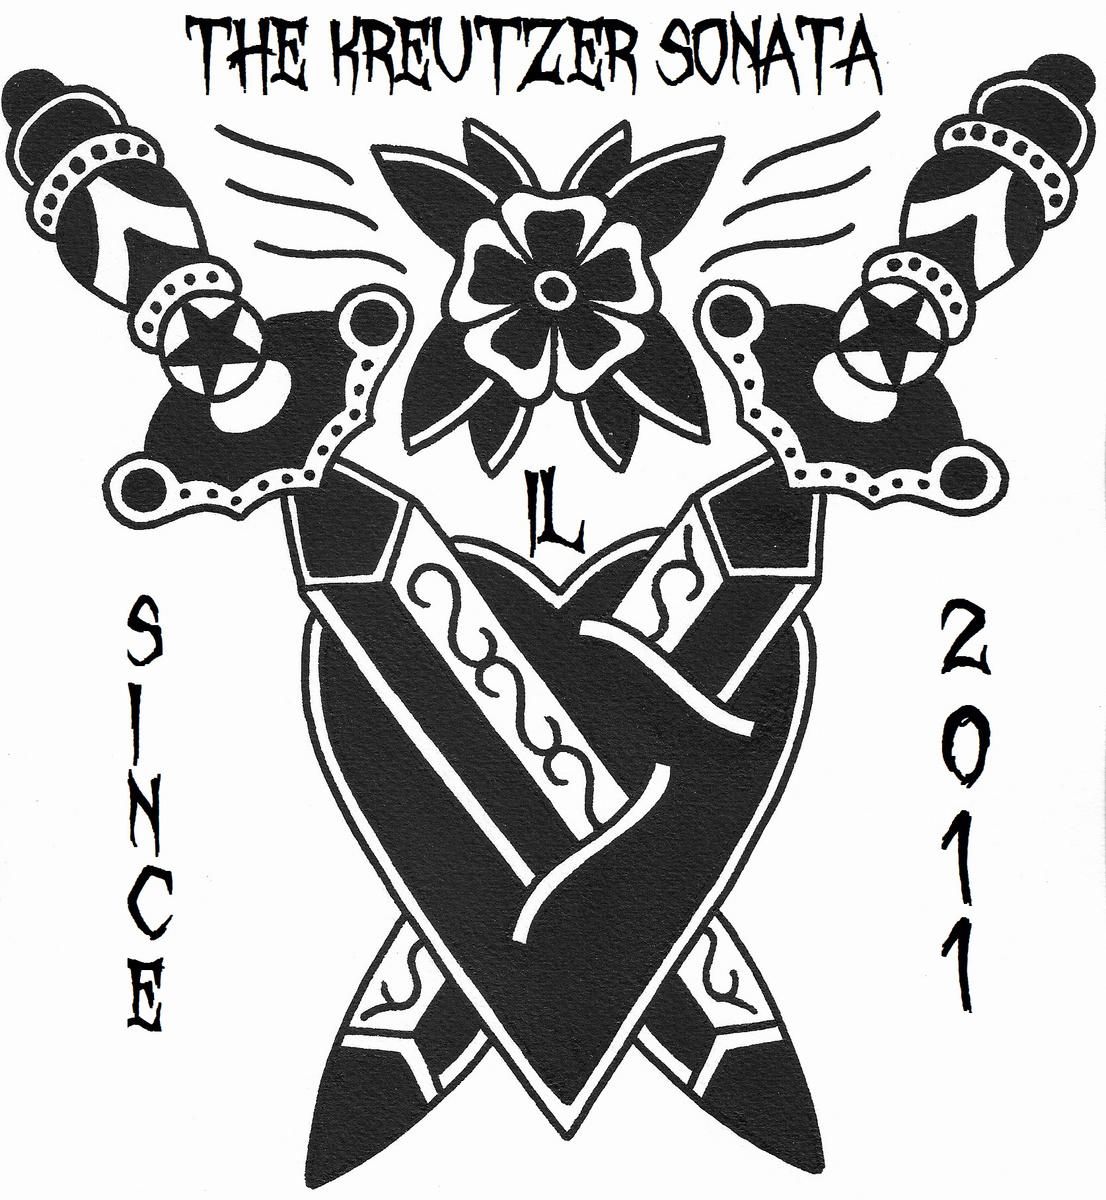 The Kreutzer Sonata (Chicago, IL) release 11 track LP